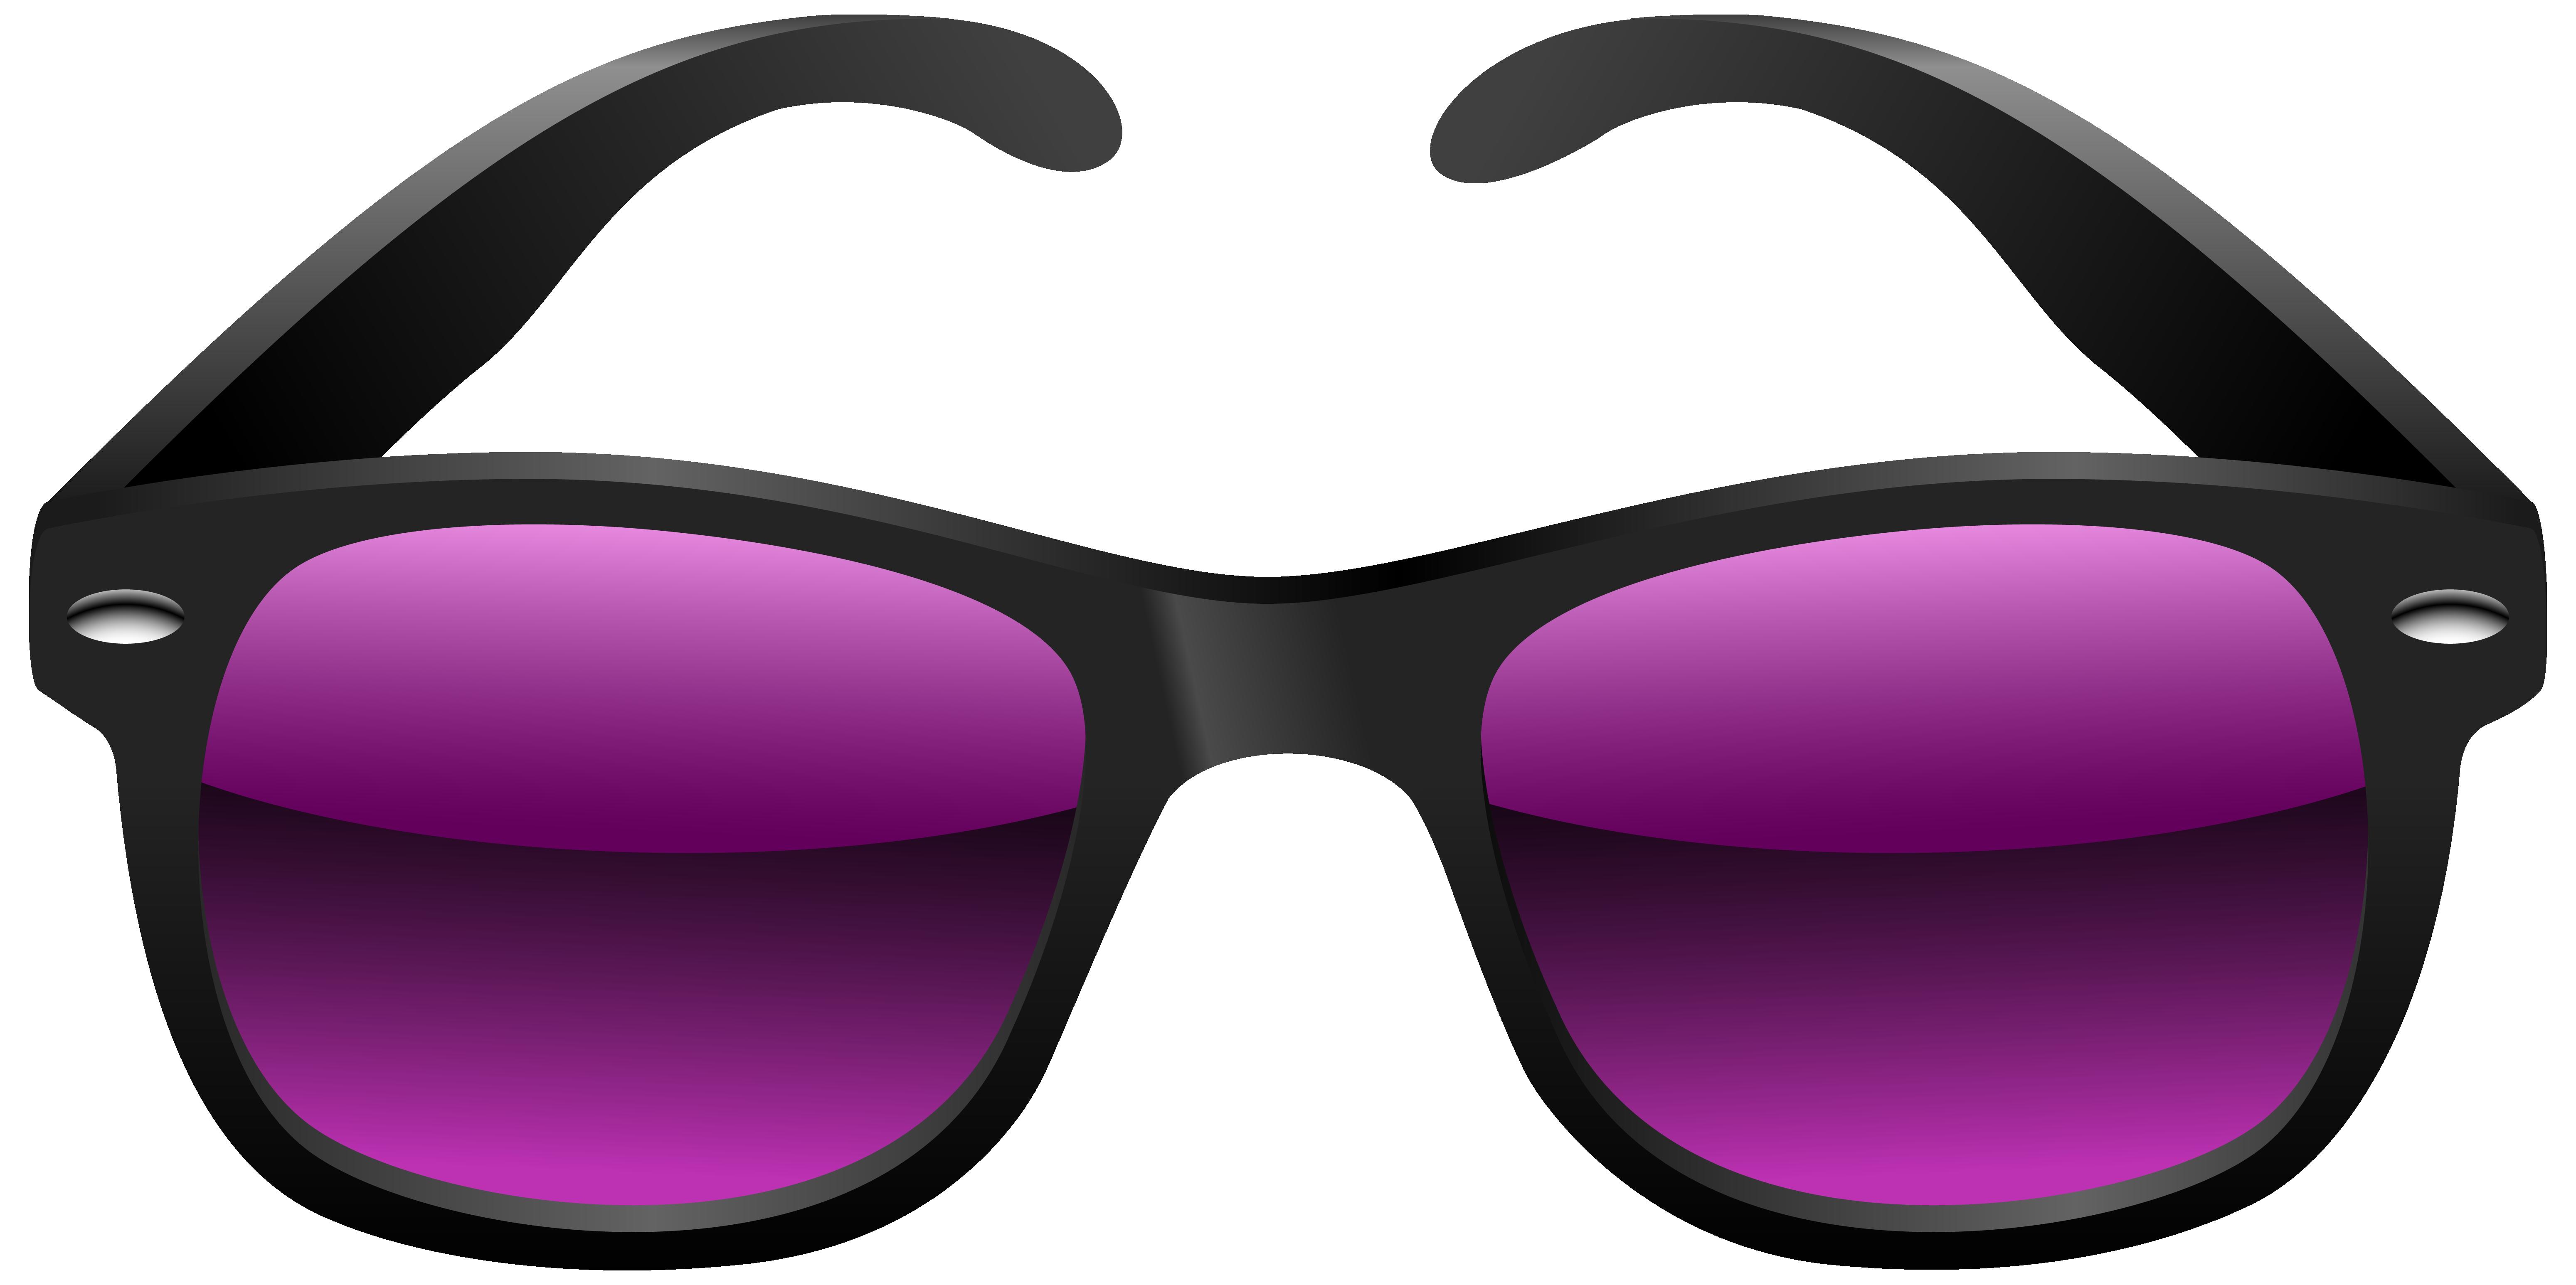 Black And Purple Sunglasses Clipart Imag-Black and purple sunglasses clipart image-3